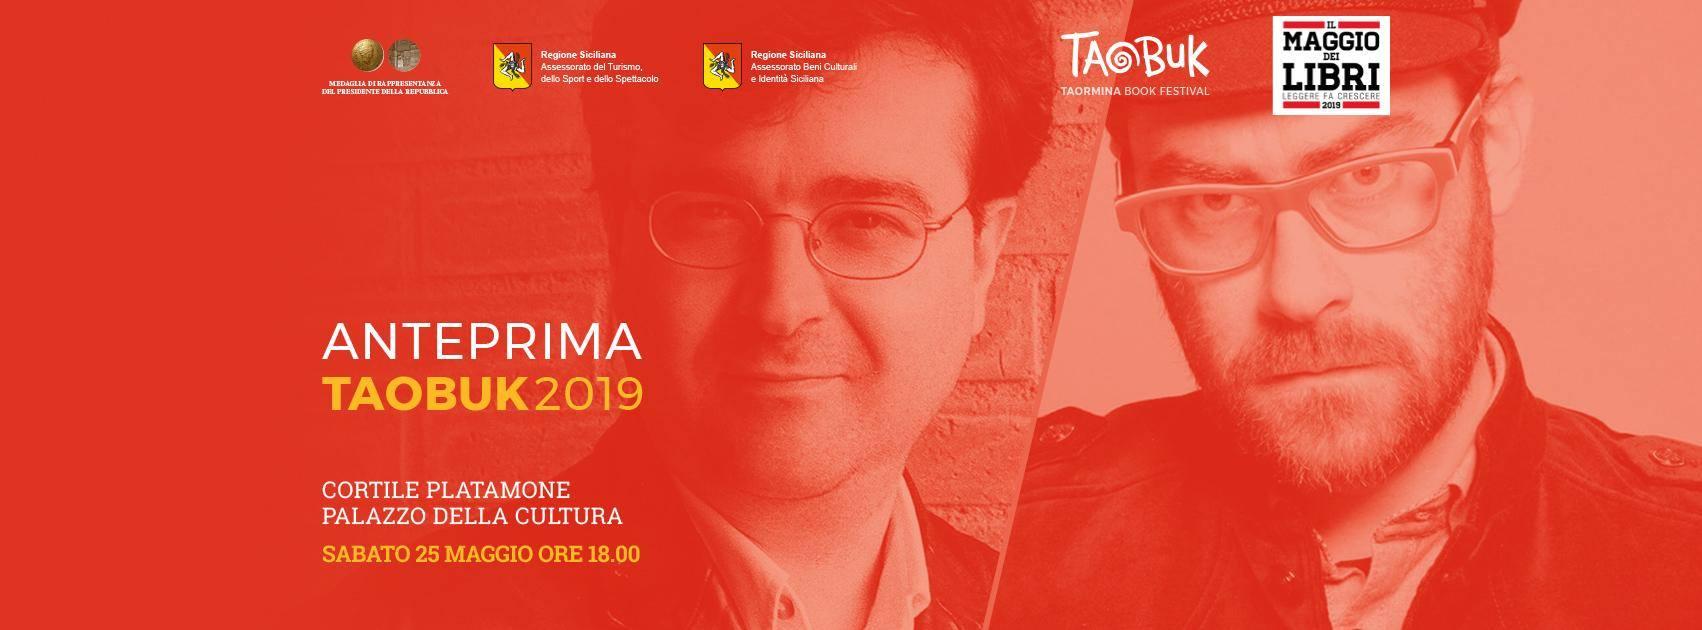 premio sicilia 2019.jpg